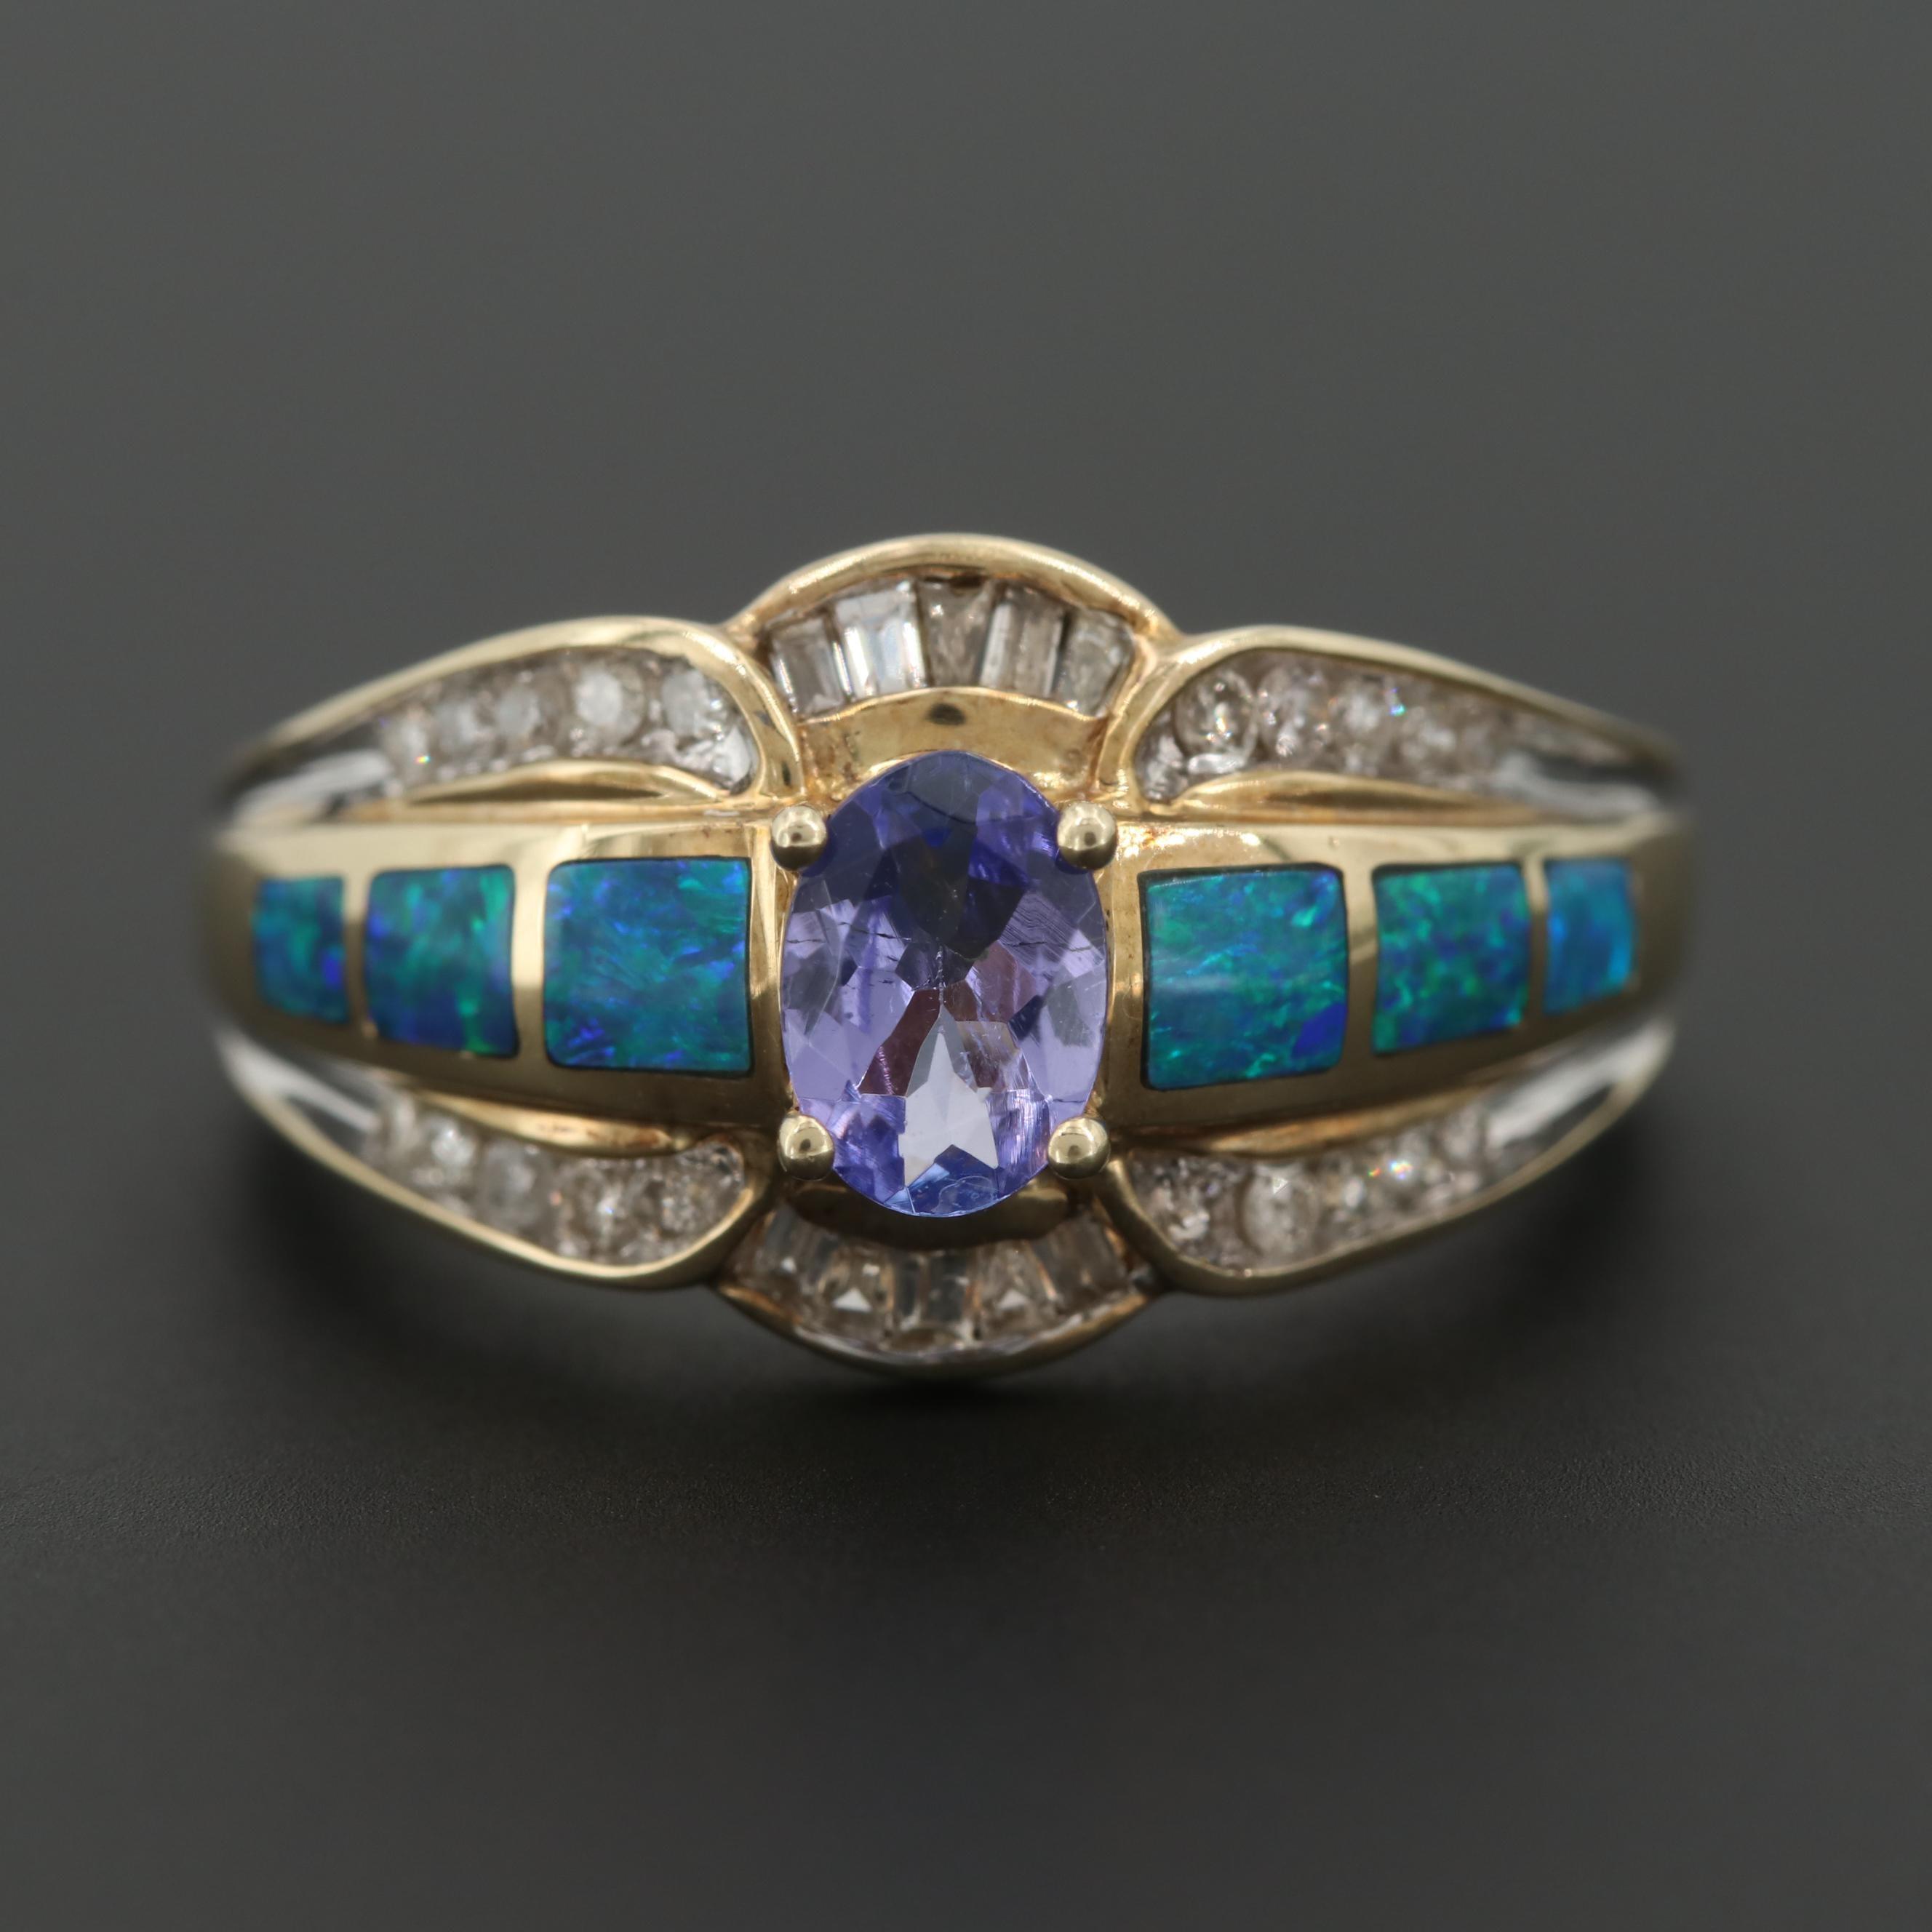 10K Yellow Gold Tanzanite, Synthetic Opal and Diamond Ring